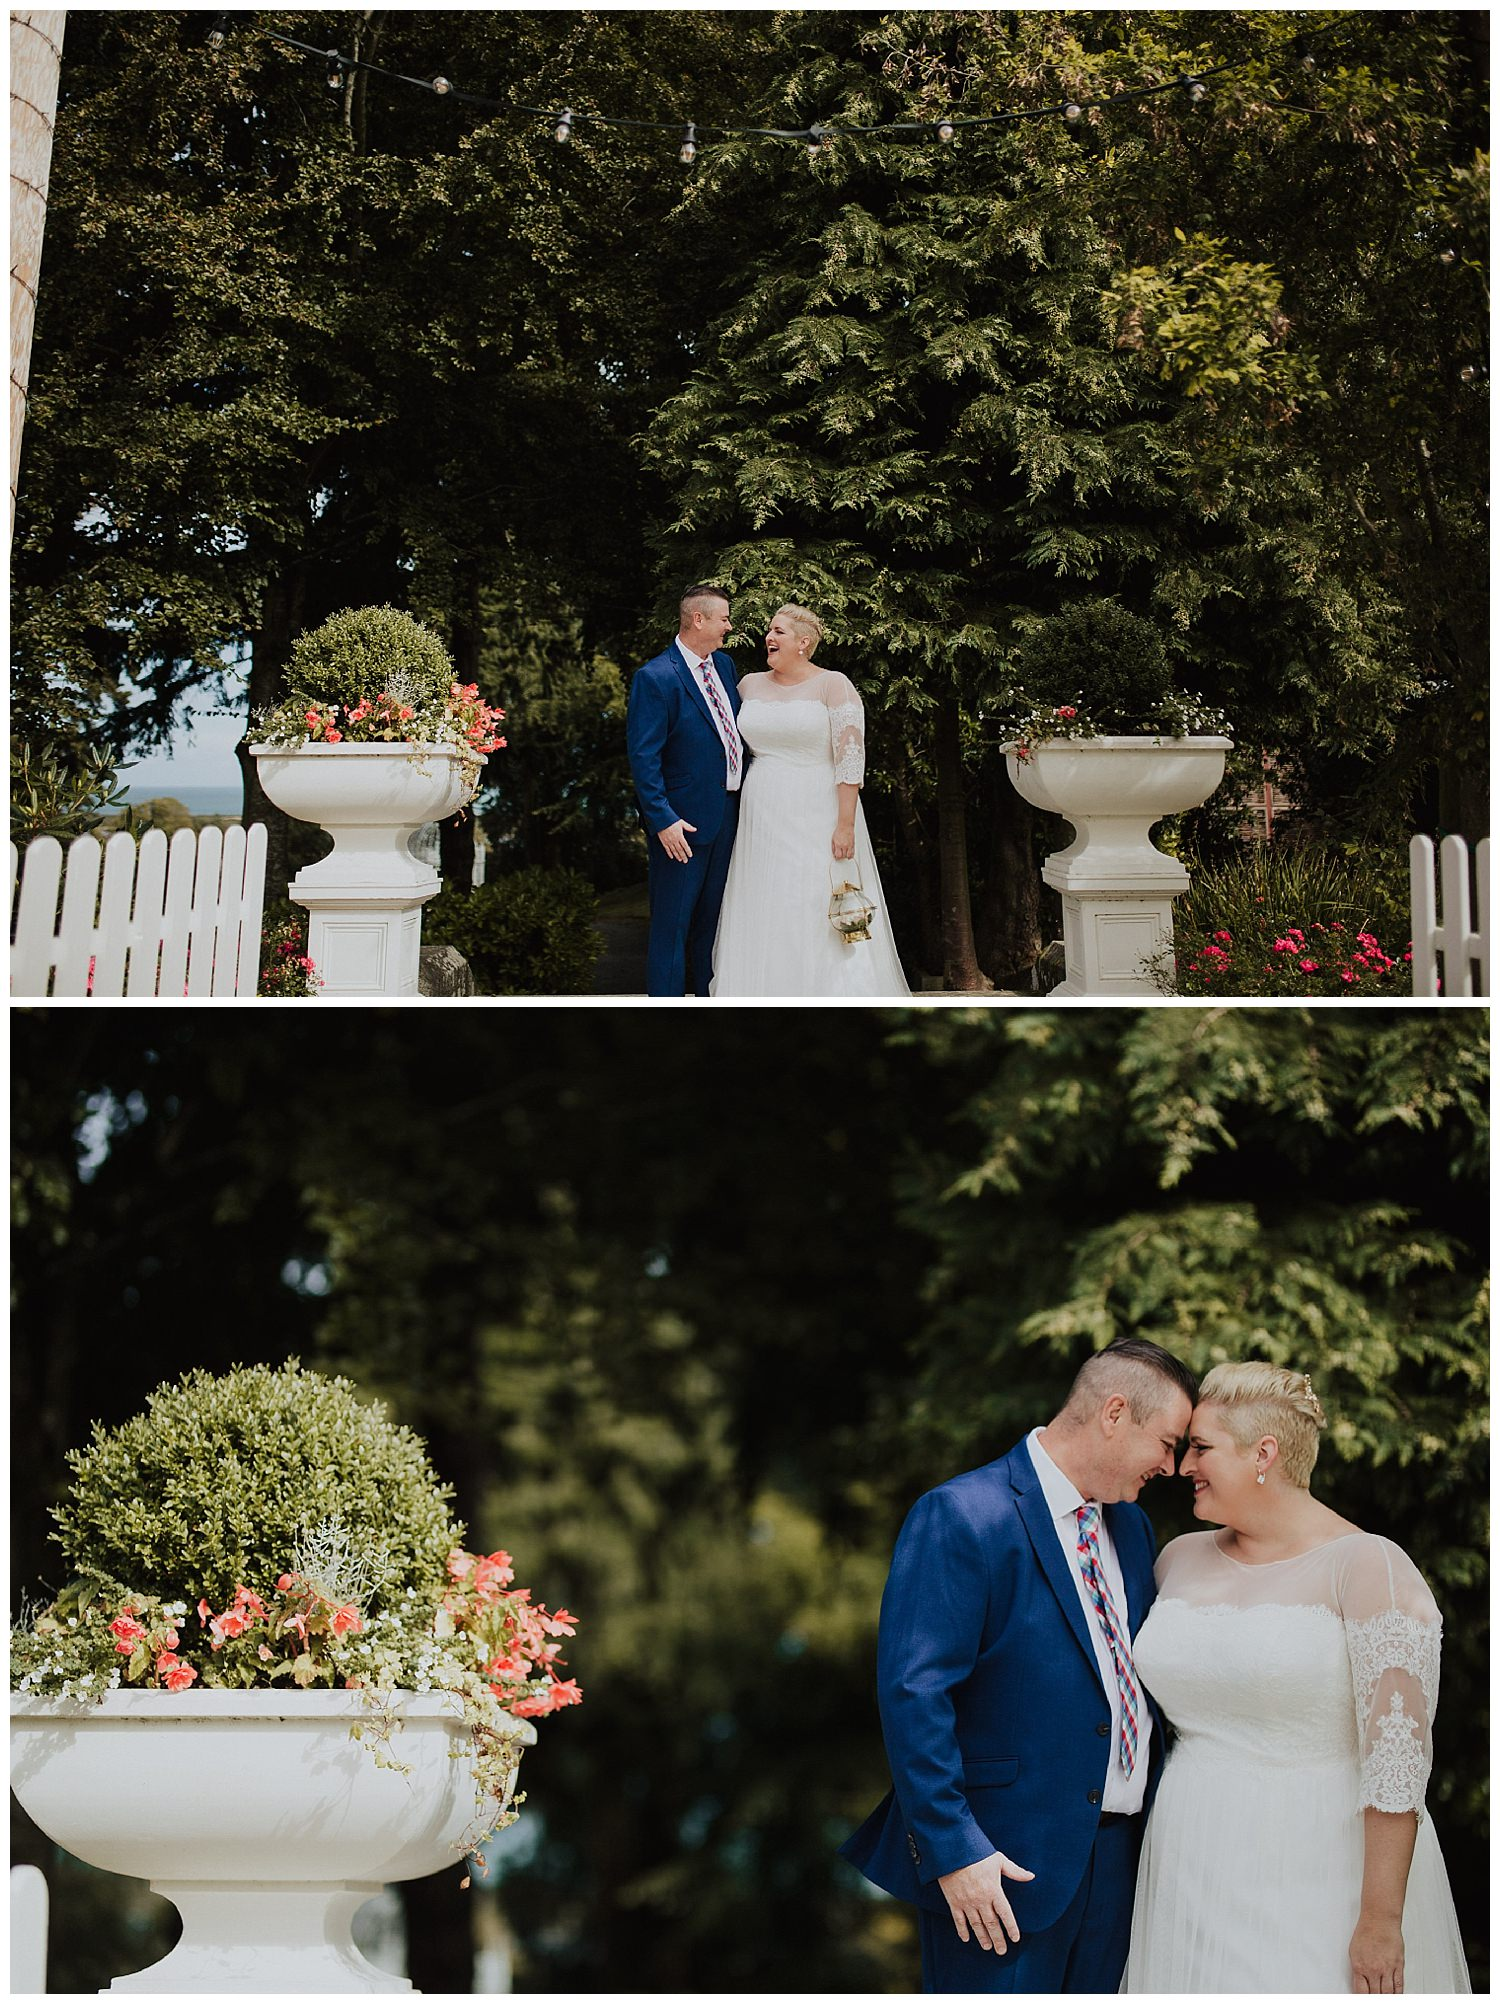 alternative_wedding_tinakilly_house_liviafigueiredo_266.jpg